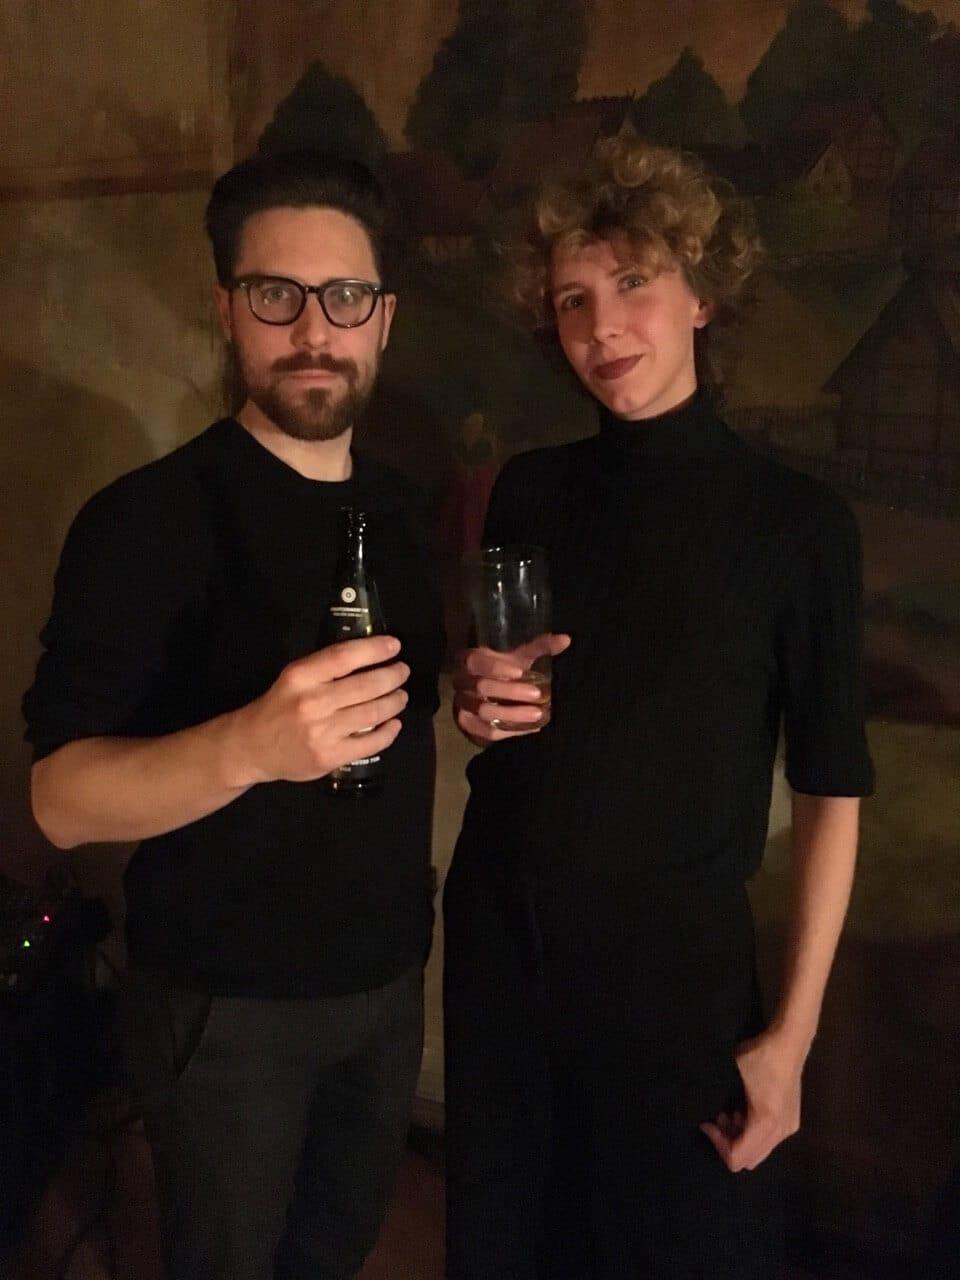 Lara Sielmann und Tillmann Severin